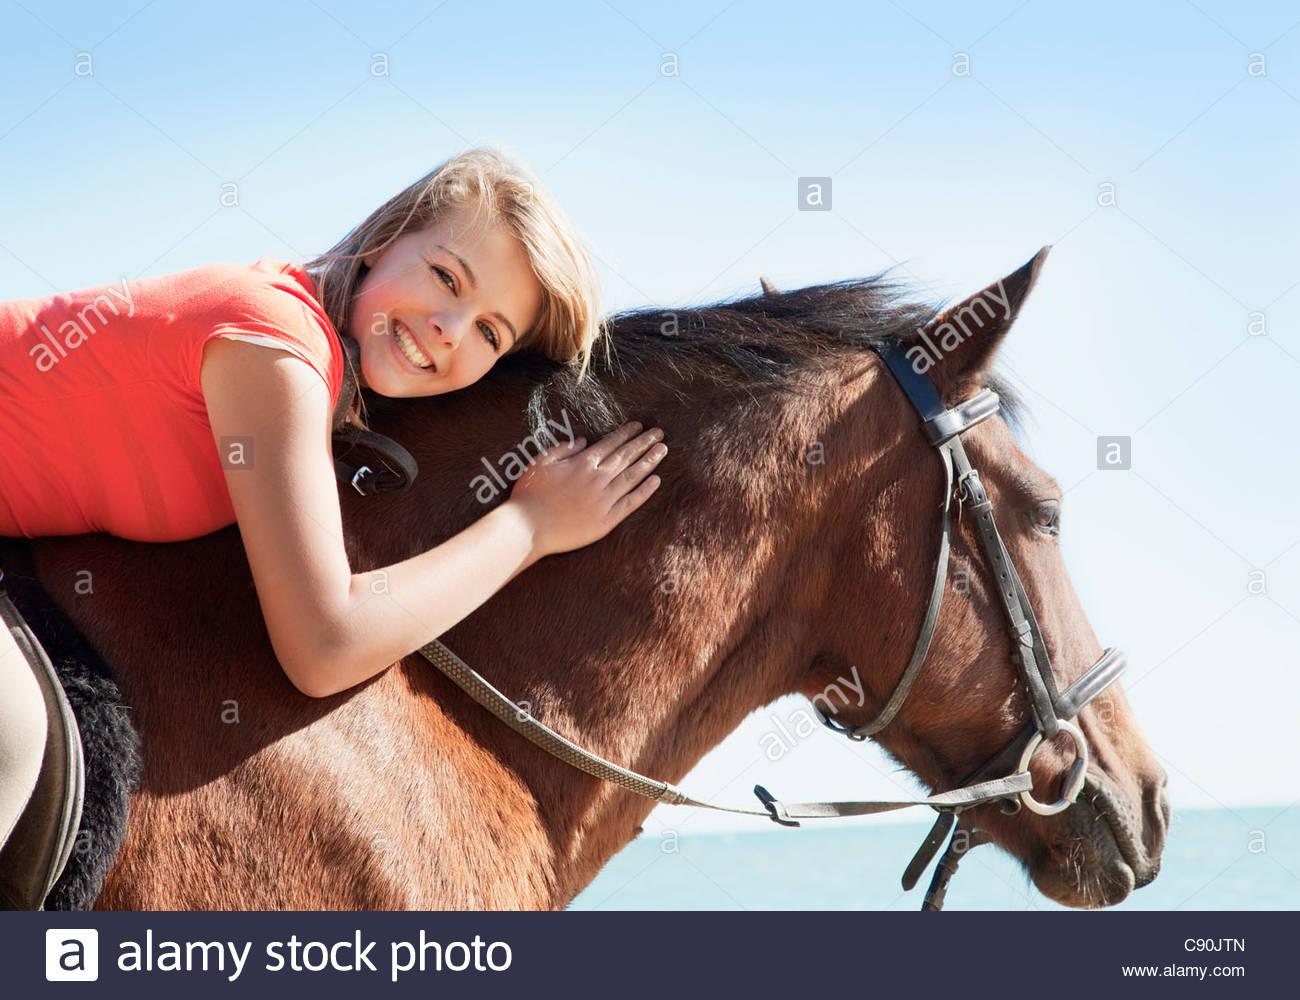 Girl petting horse on beach - Stock Image